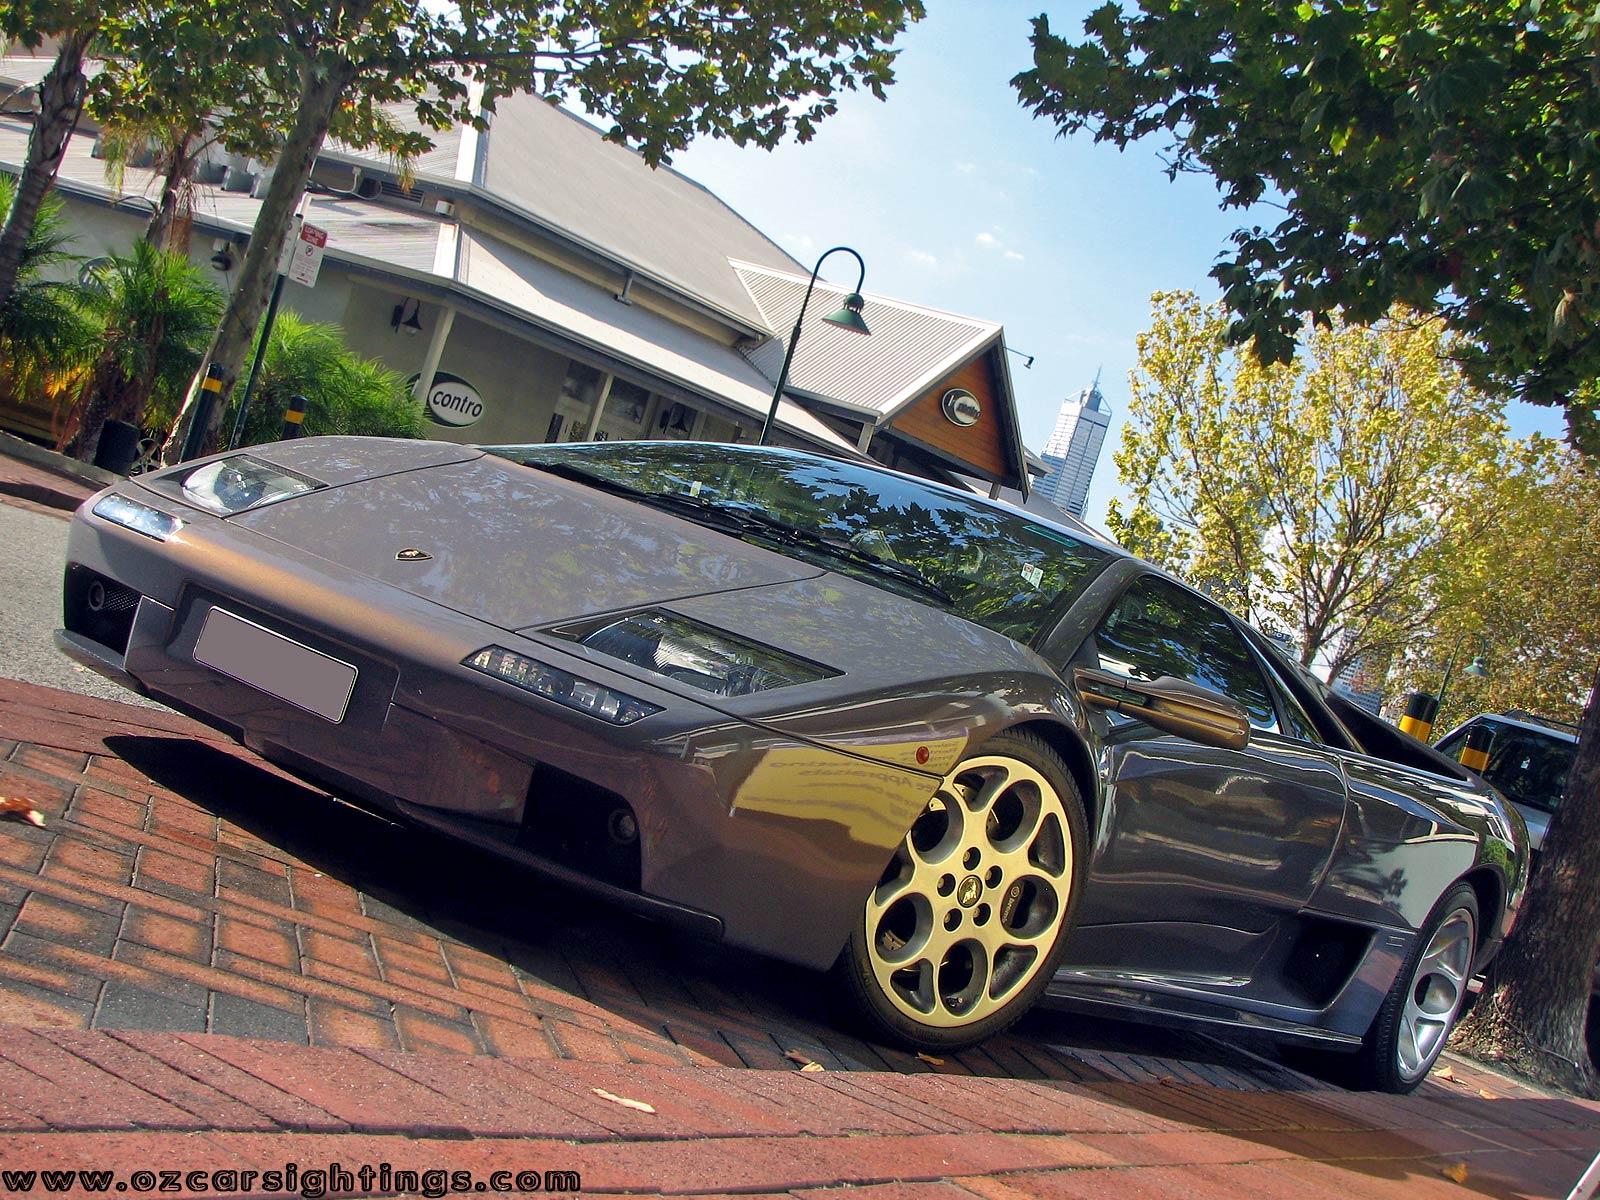 Lamborghini Perth Car Spotting: lamborghini-diablo-6 0-(42)